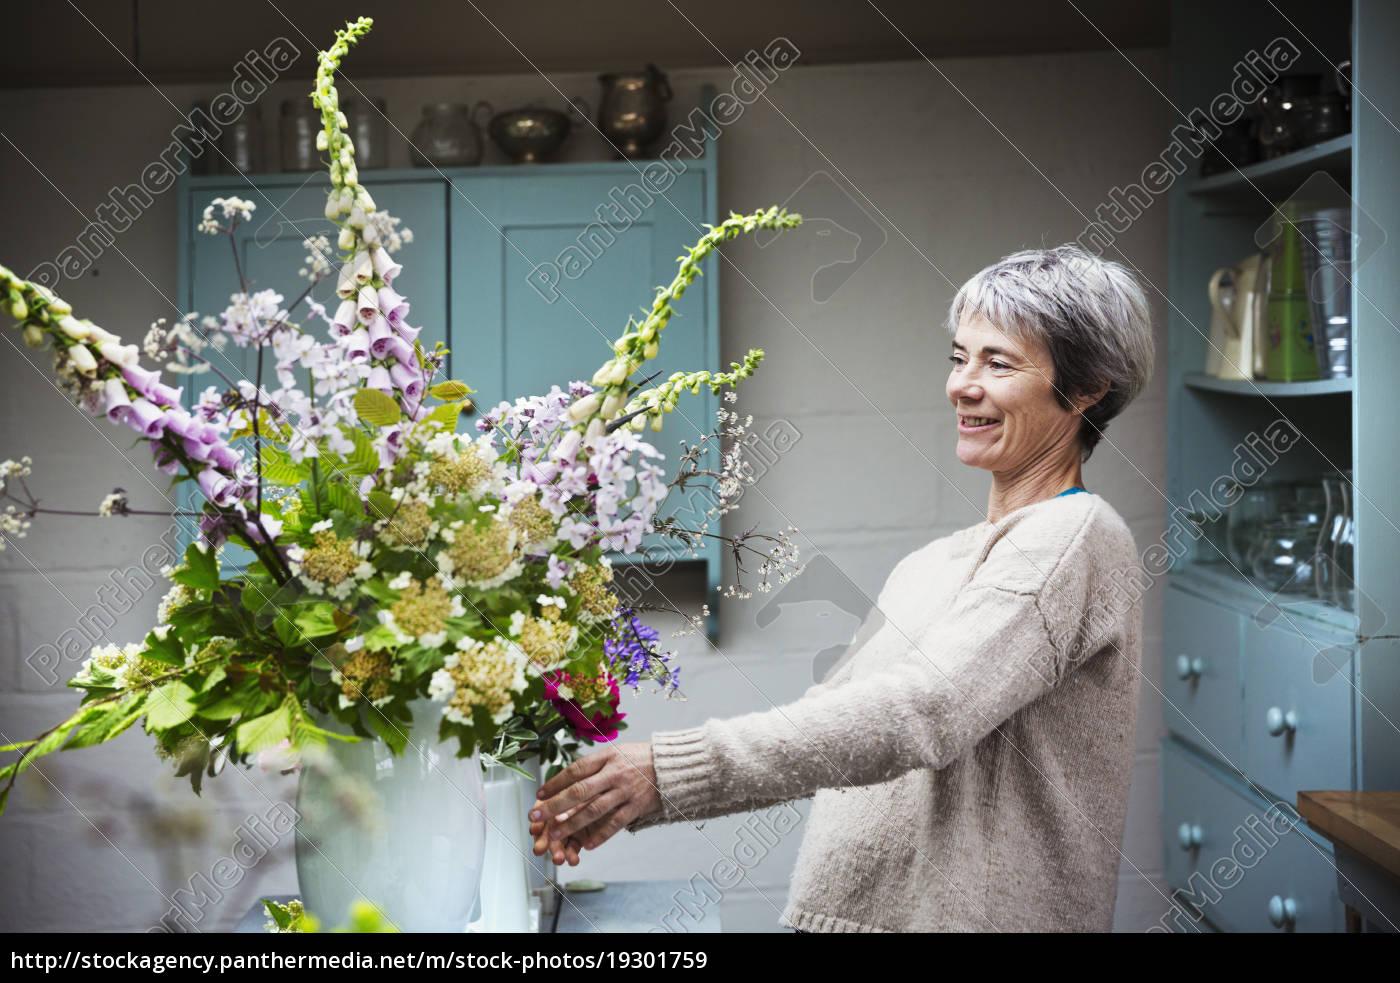 A Florist Working On A Tall Vase Arrangement Of Stock Photo 19301759 Panthermedia Stock Agency,Kitchen Garden Window Ideas